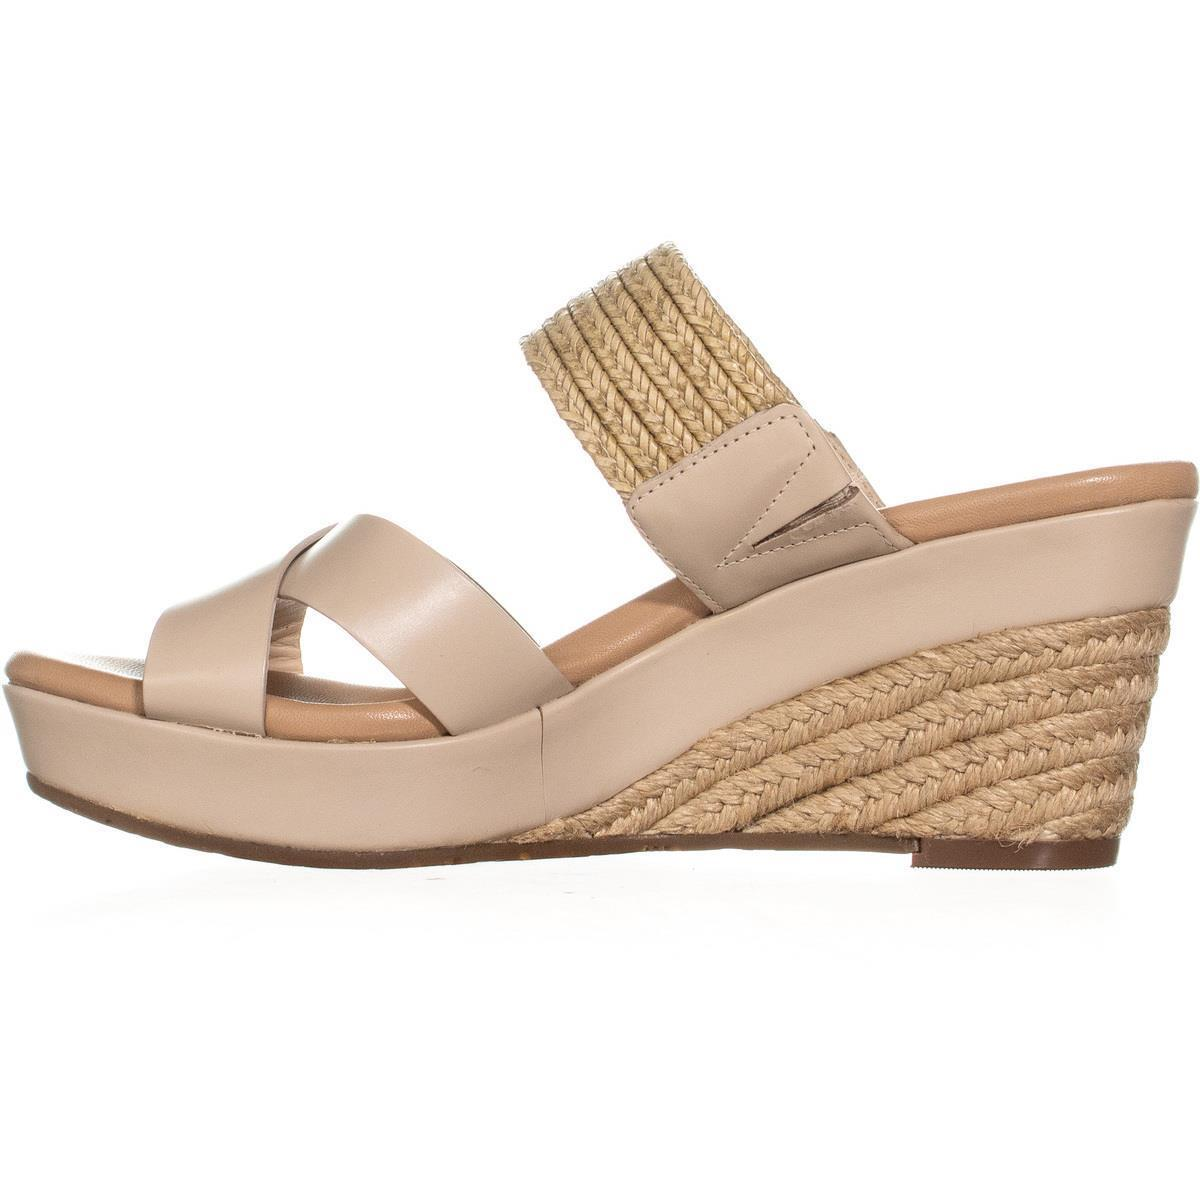 UGG Australia Adriana Wedge Mule Sandals, Horchata, 9 US / 40 EU